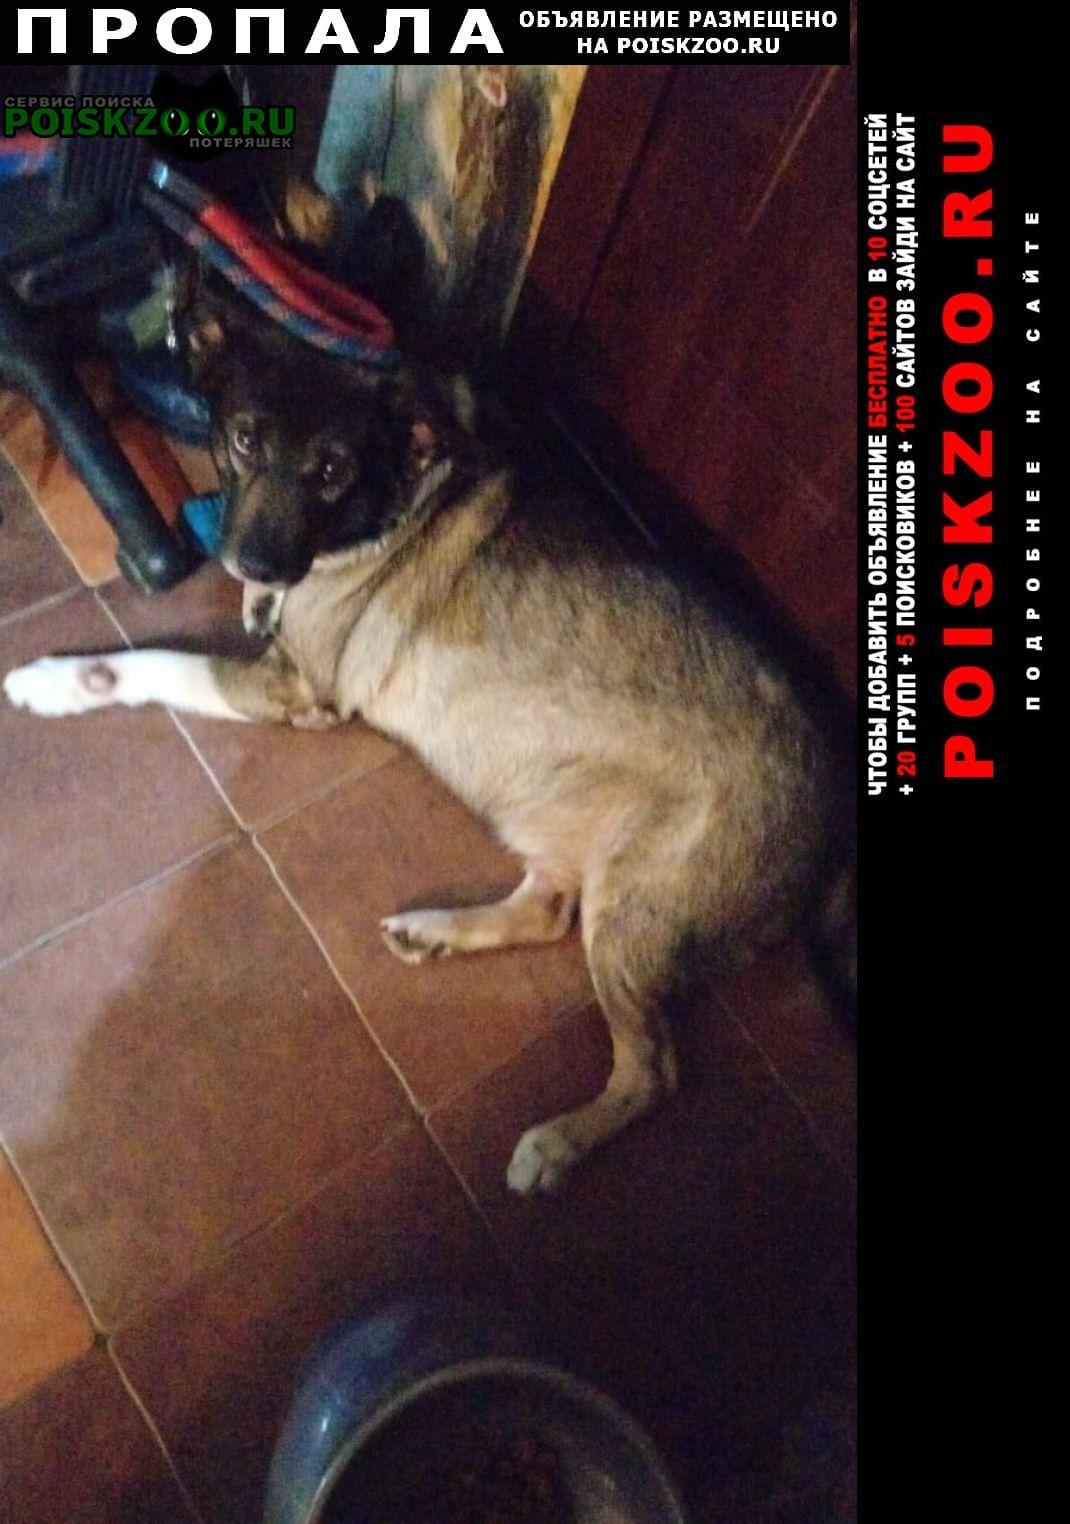 Пропала собака Комсомольск-на-Амуре